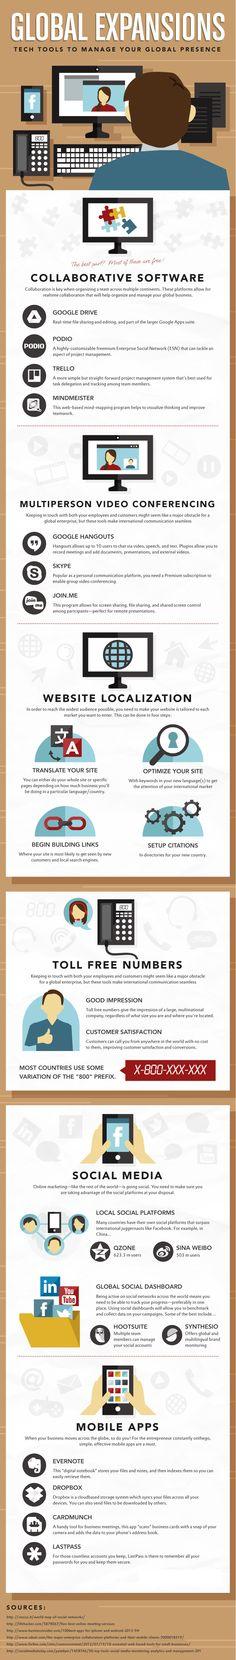 Must-Have Global #Tech Tools #smallbiz #startup #entrepreneur